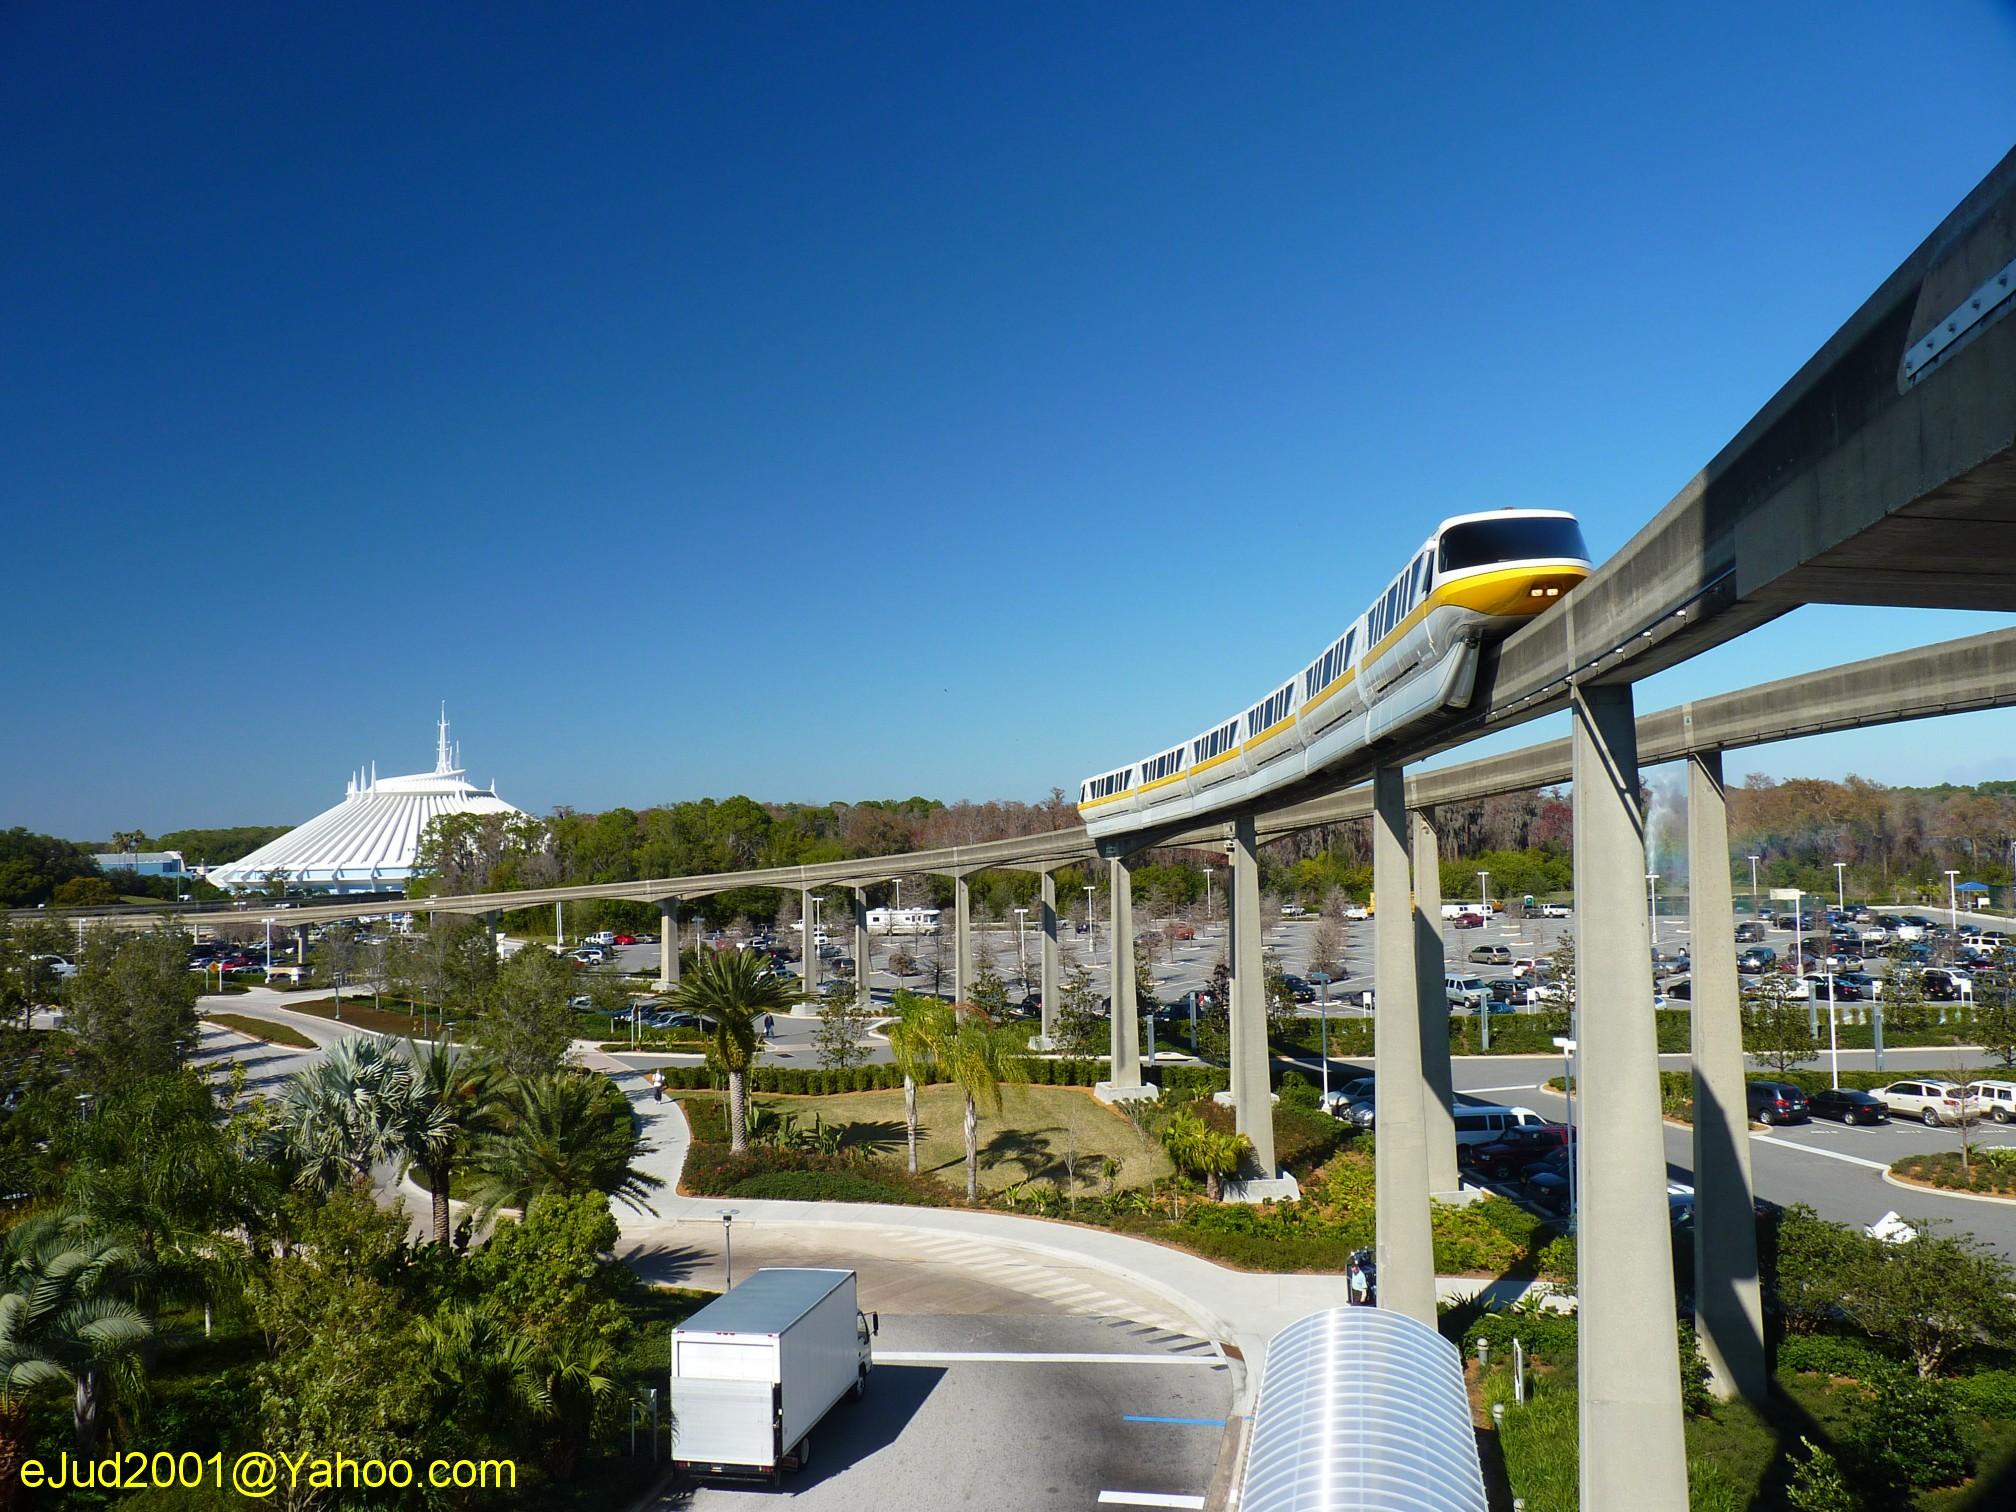 Jud's Disney POTD: MOUNTAIN AND MONORAIL